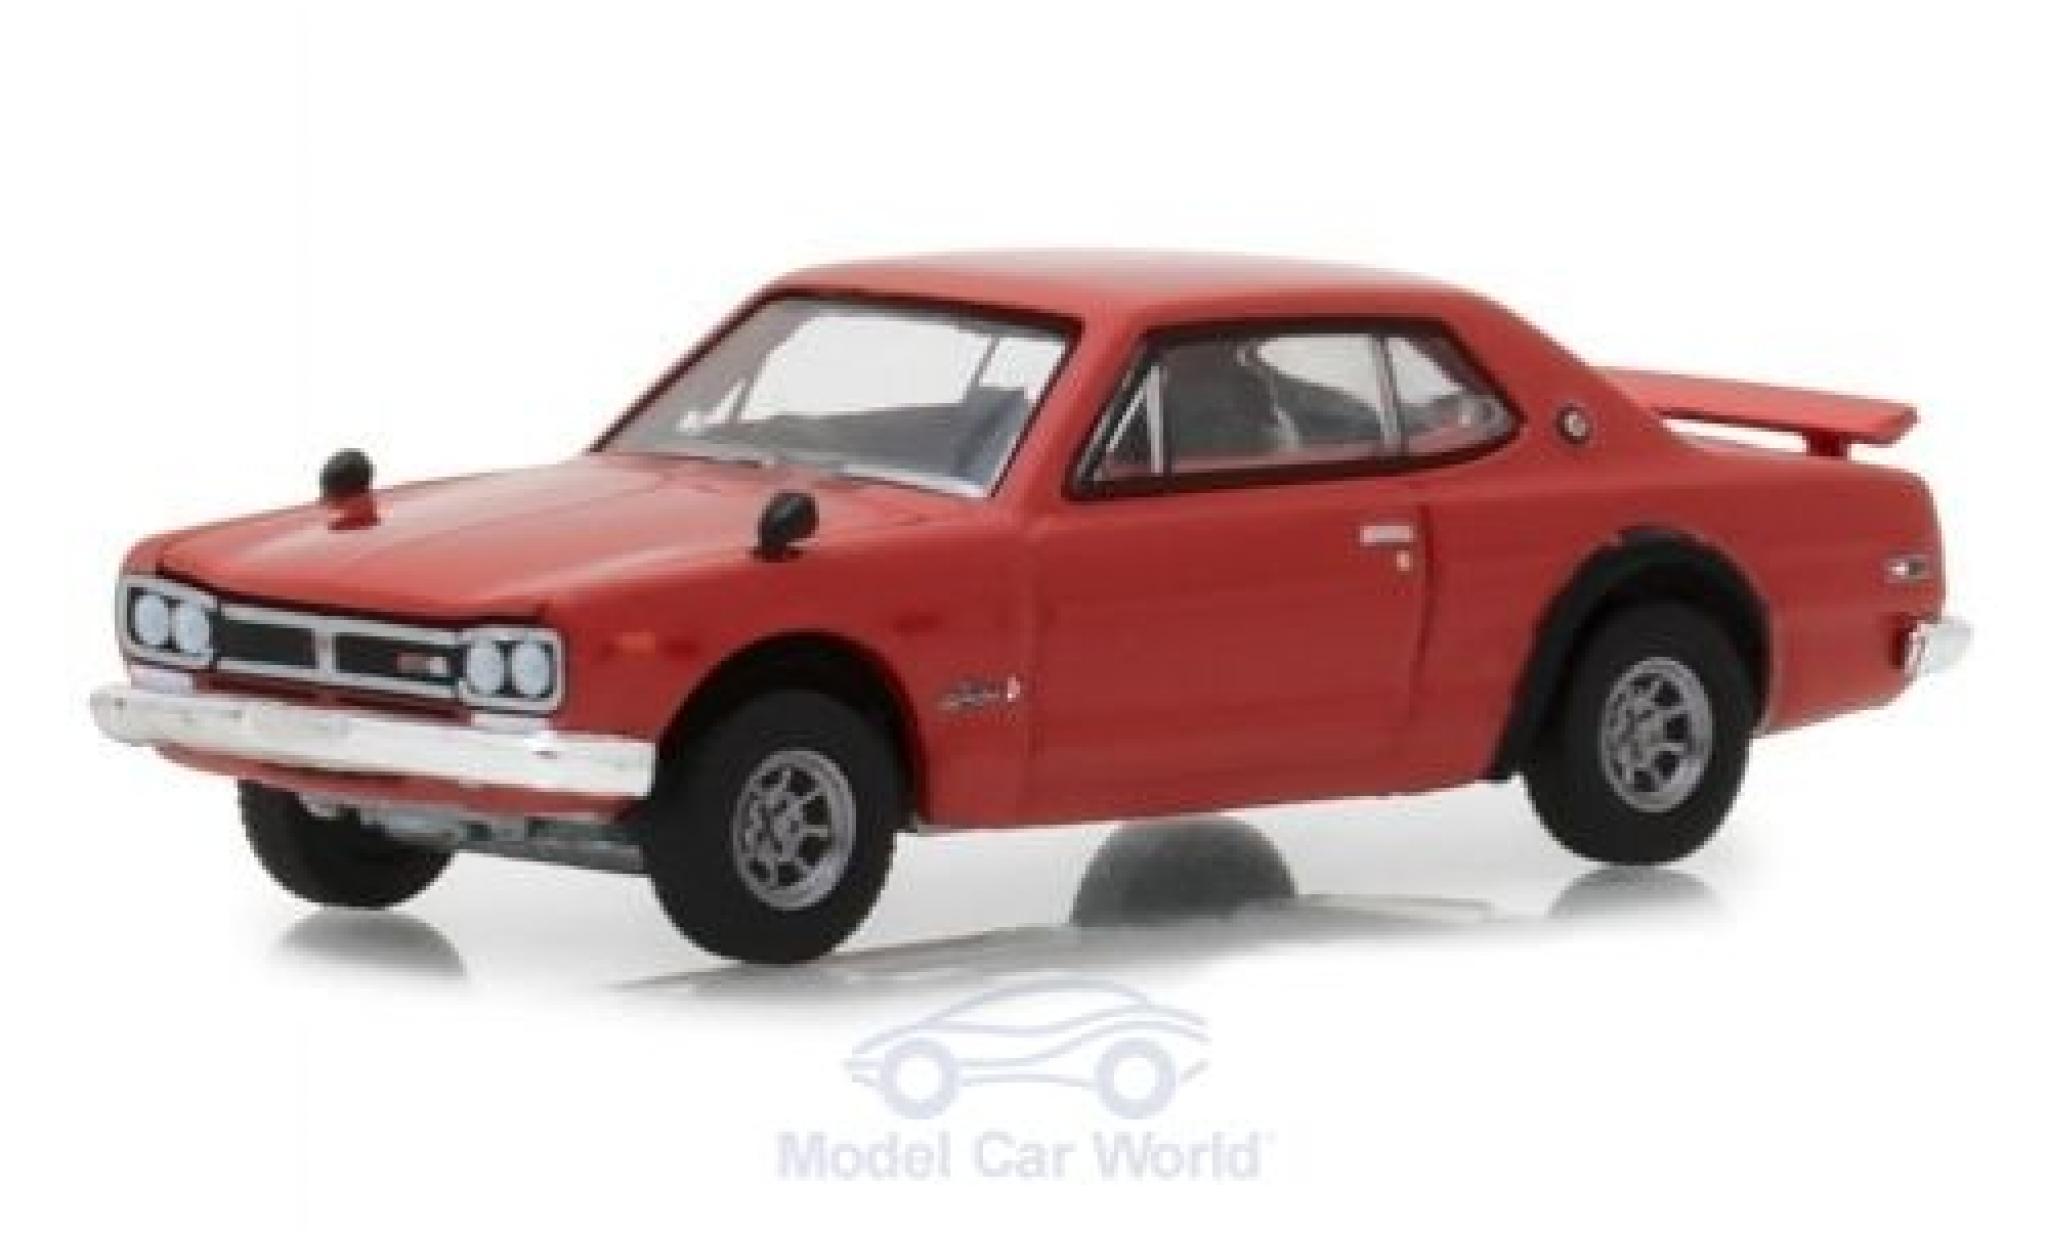 Nissan Skyline 1/64 Greenlight 2000 GT-R red 1972